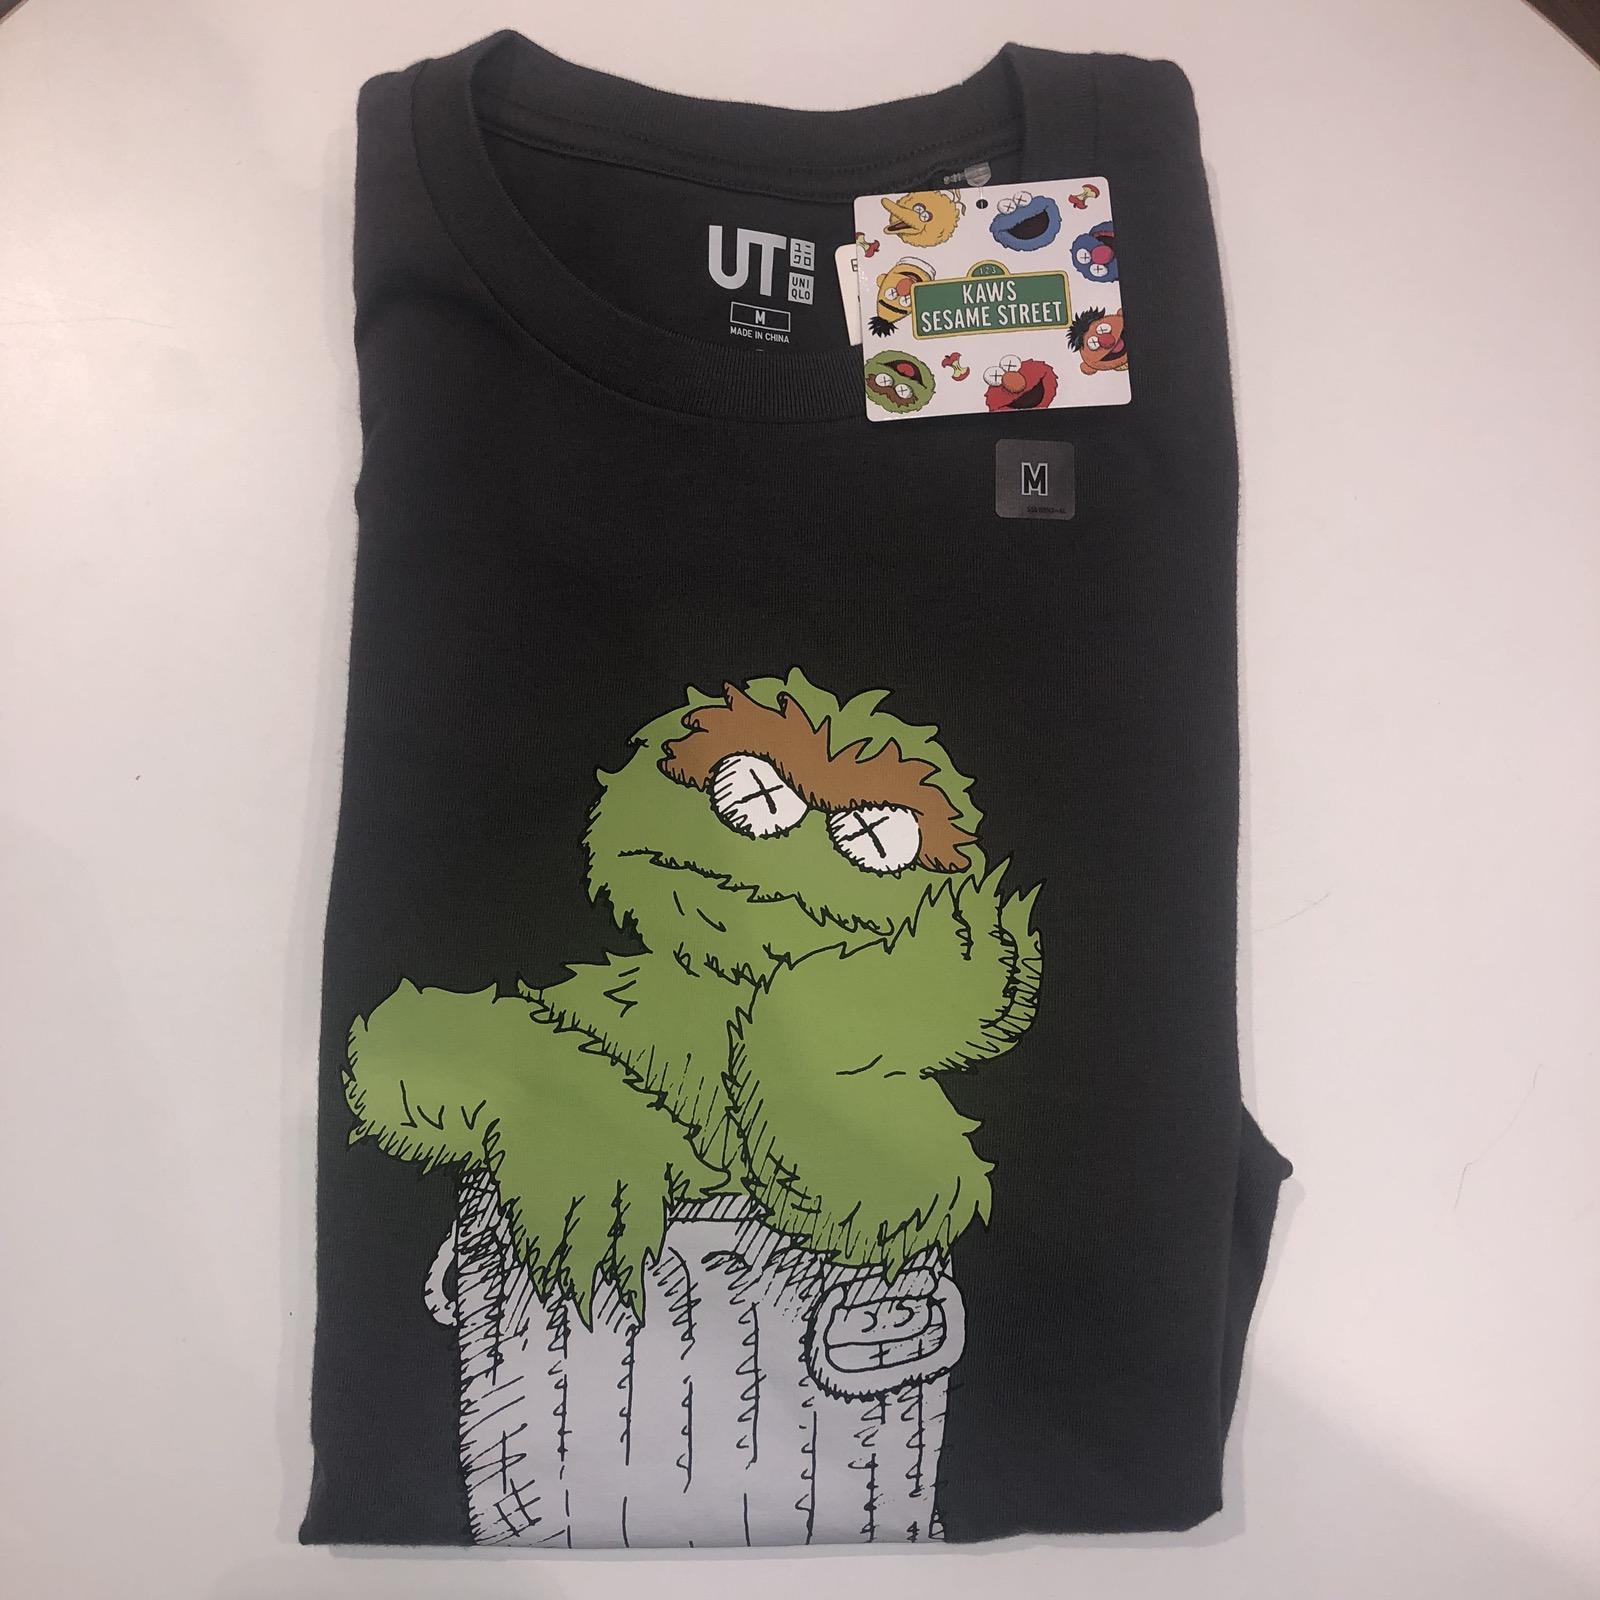 Kaws Sesame Street Uniqlo Oscar The Grouch Trash Can Medium Grey Shirt Rare Limited Tee M In Hand Ready To Ship